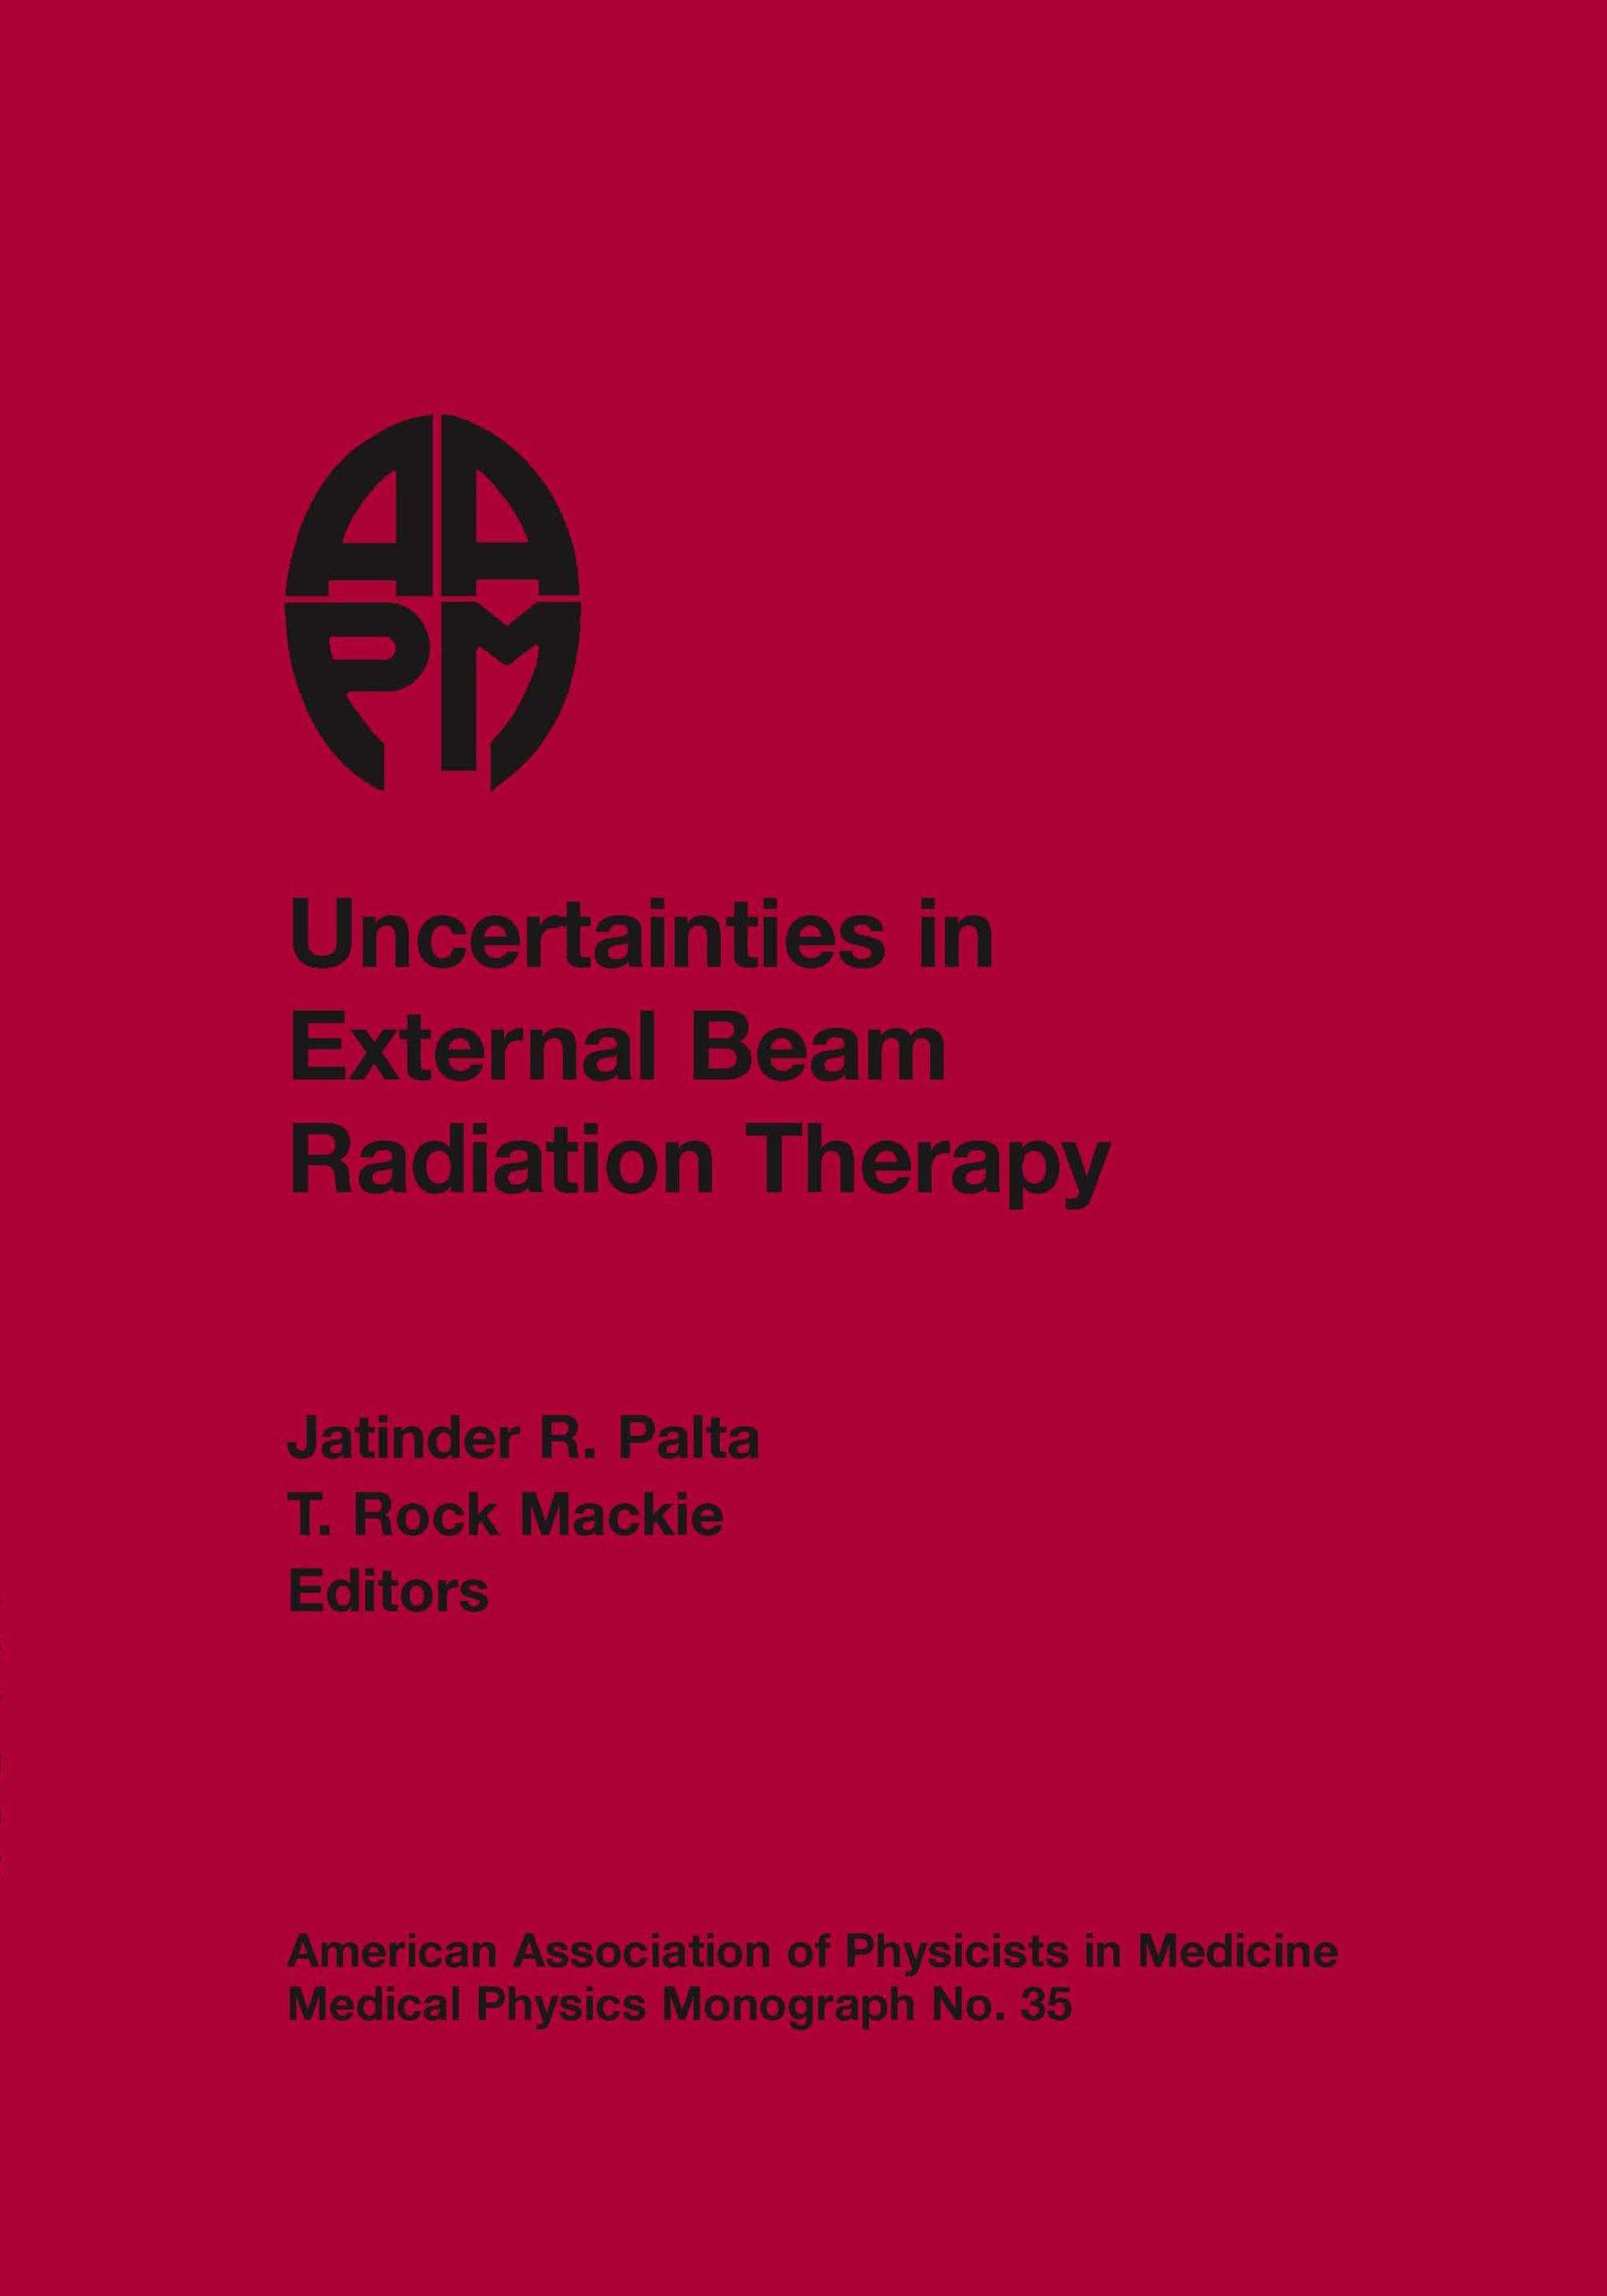 Download Uncertainties in External Beam Radiation Therapy (AAPM 2011 Summer School) (CD-ROM Version) ebook